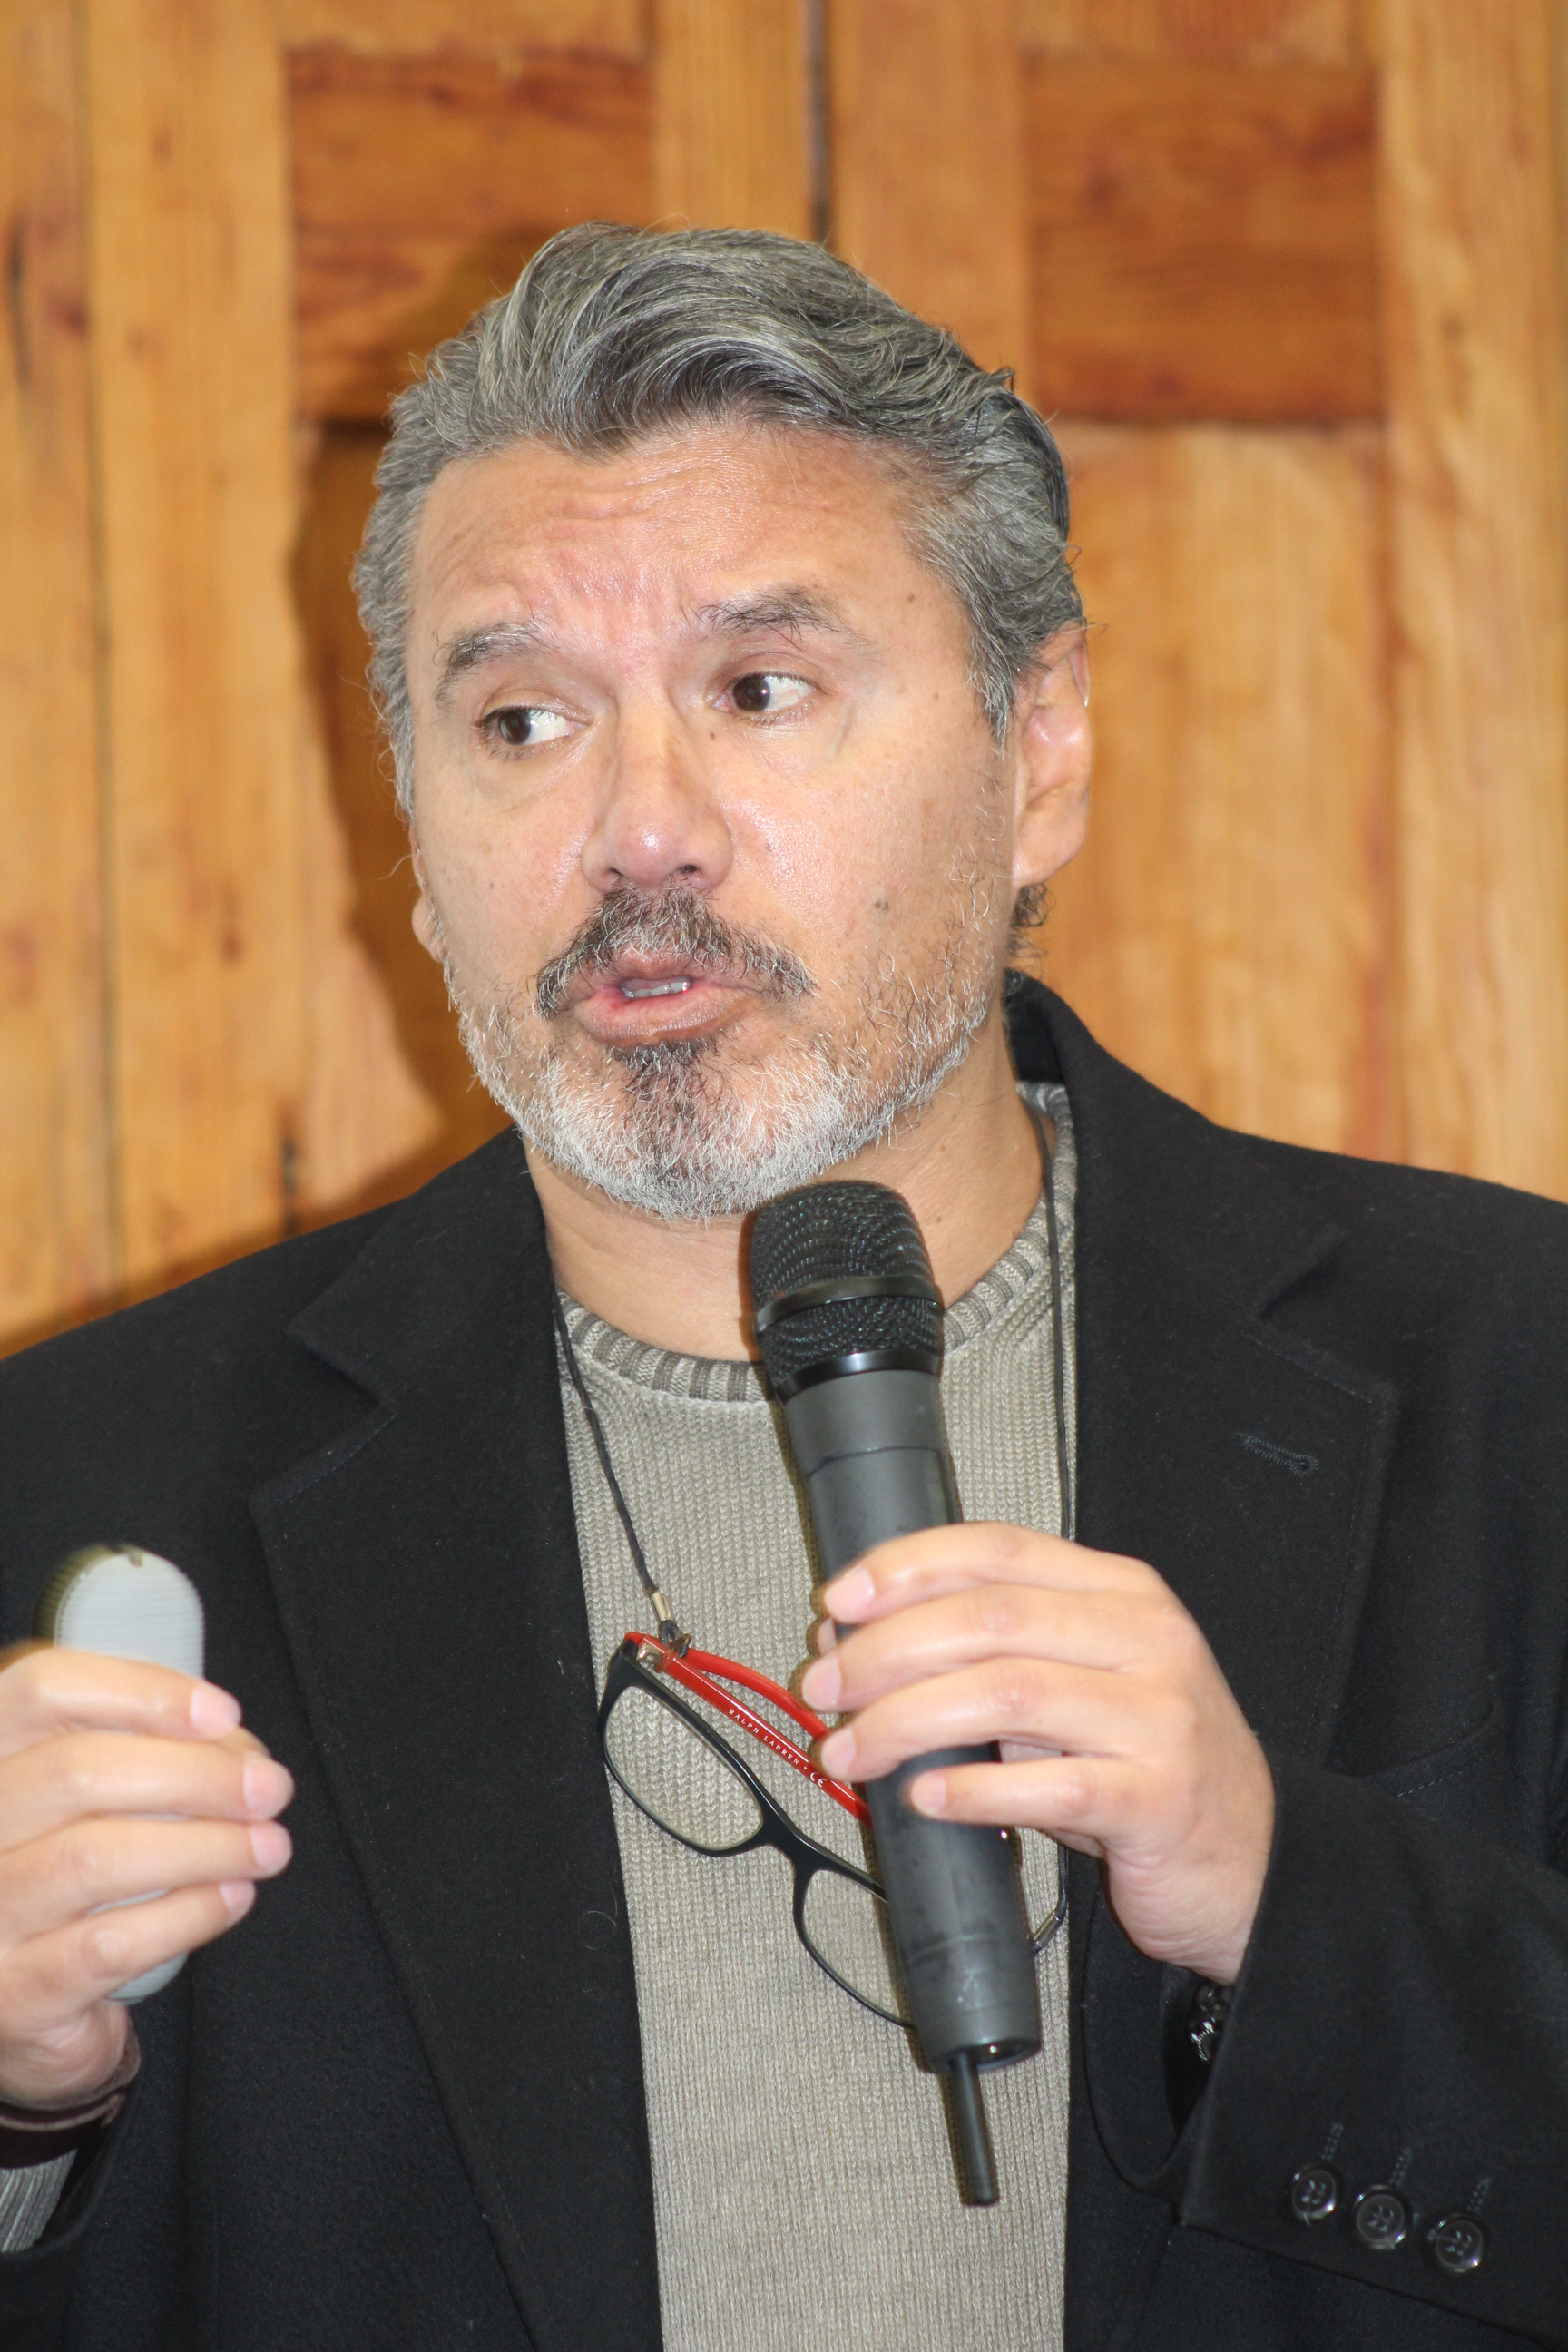 Carlos Félix Garrocho Rangel